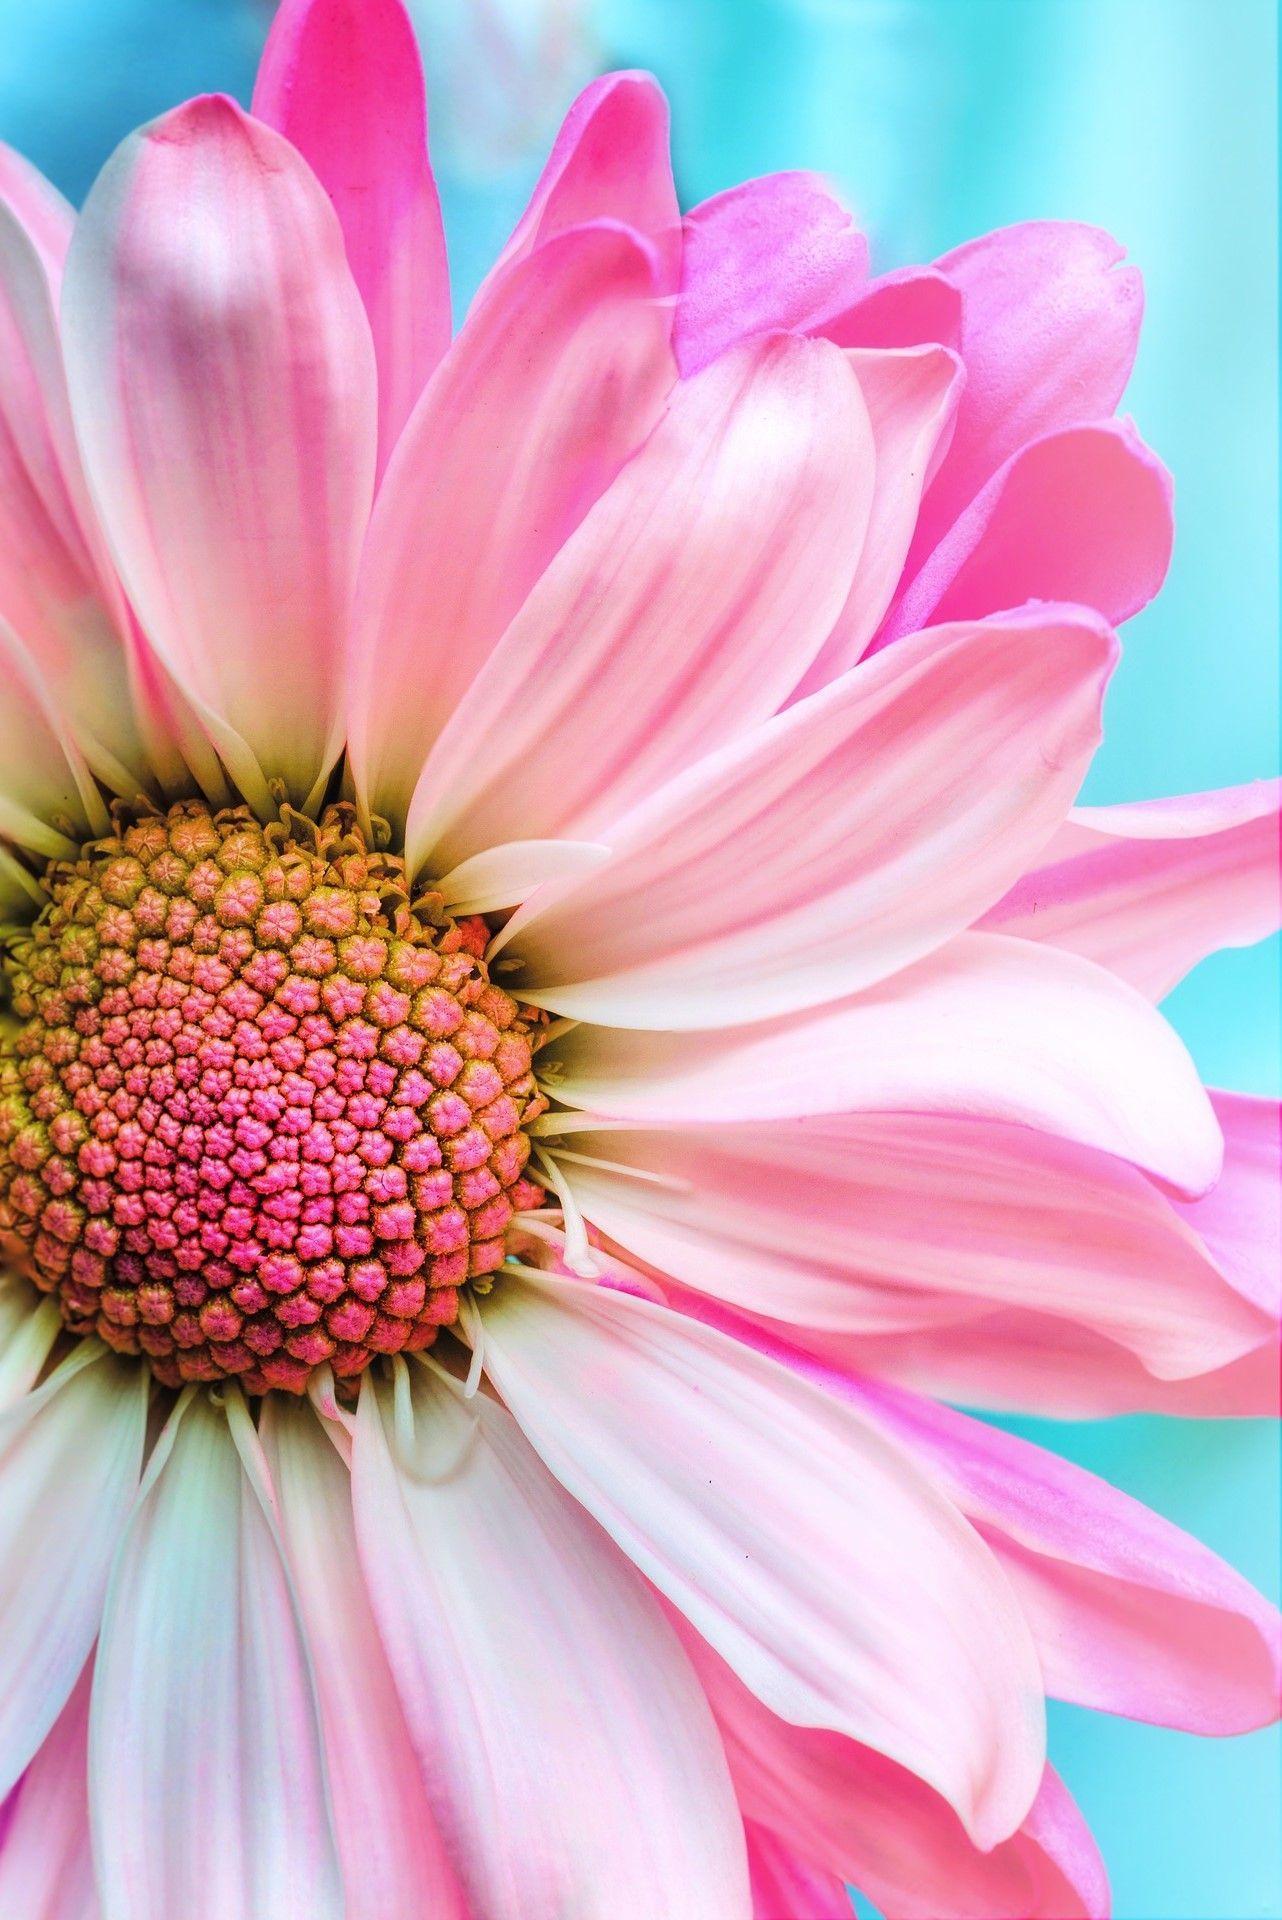 Pink Flowers pinkflowerwallpaperiphone Sunflower